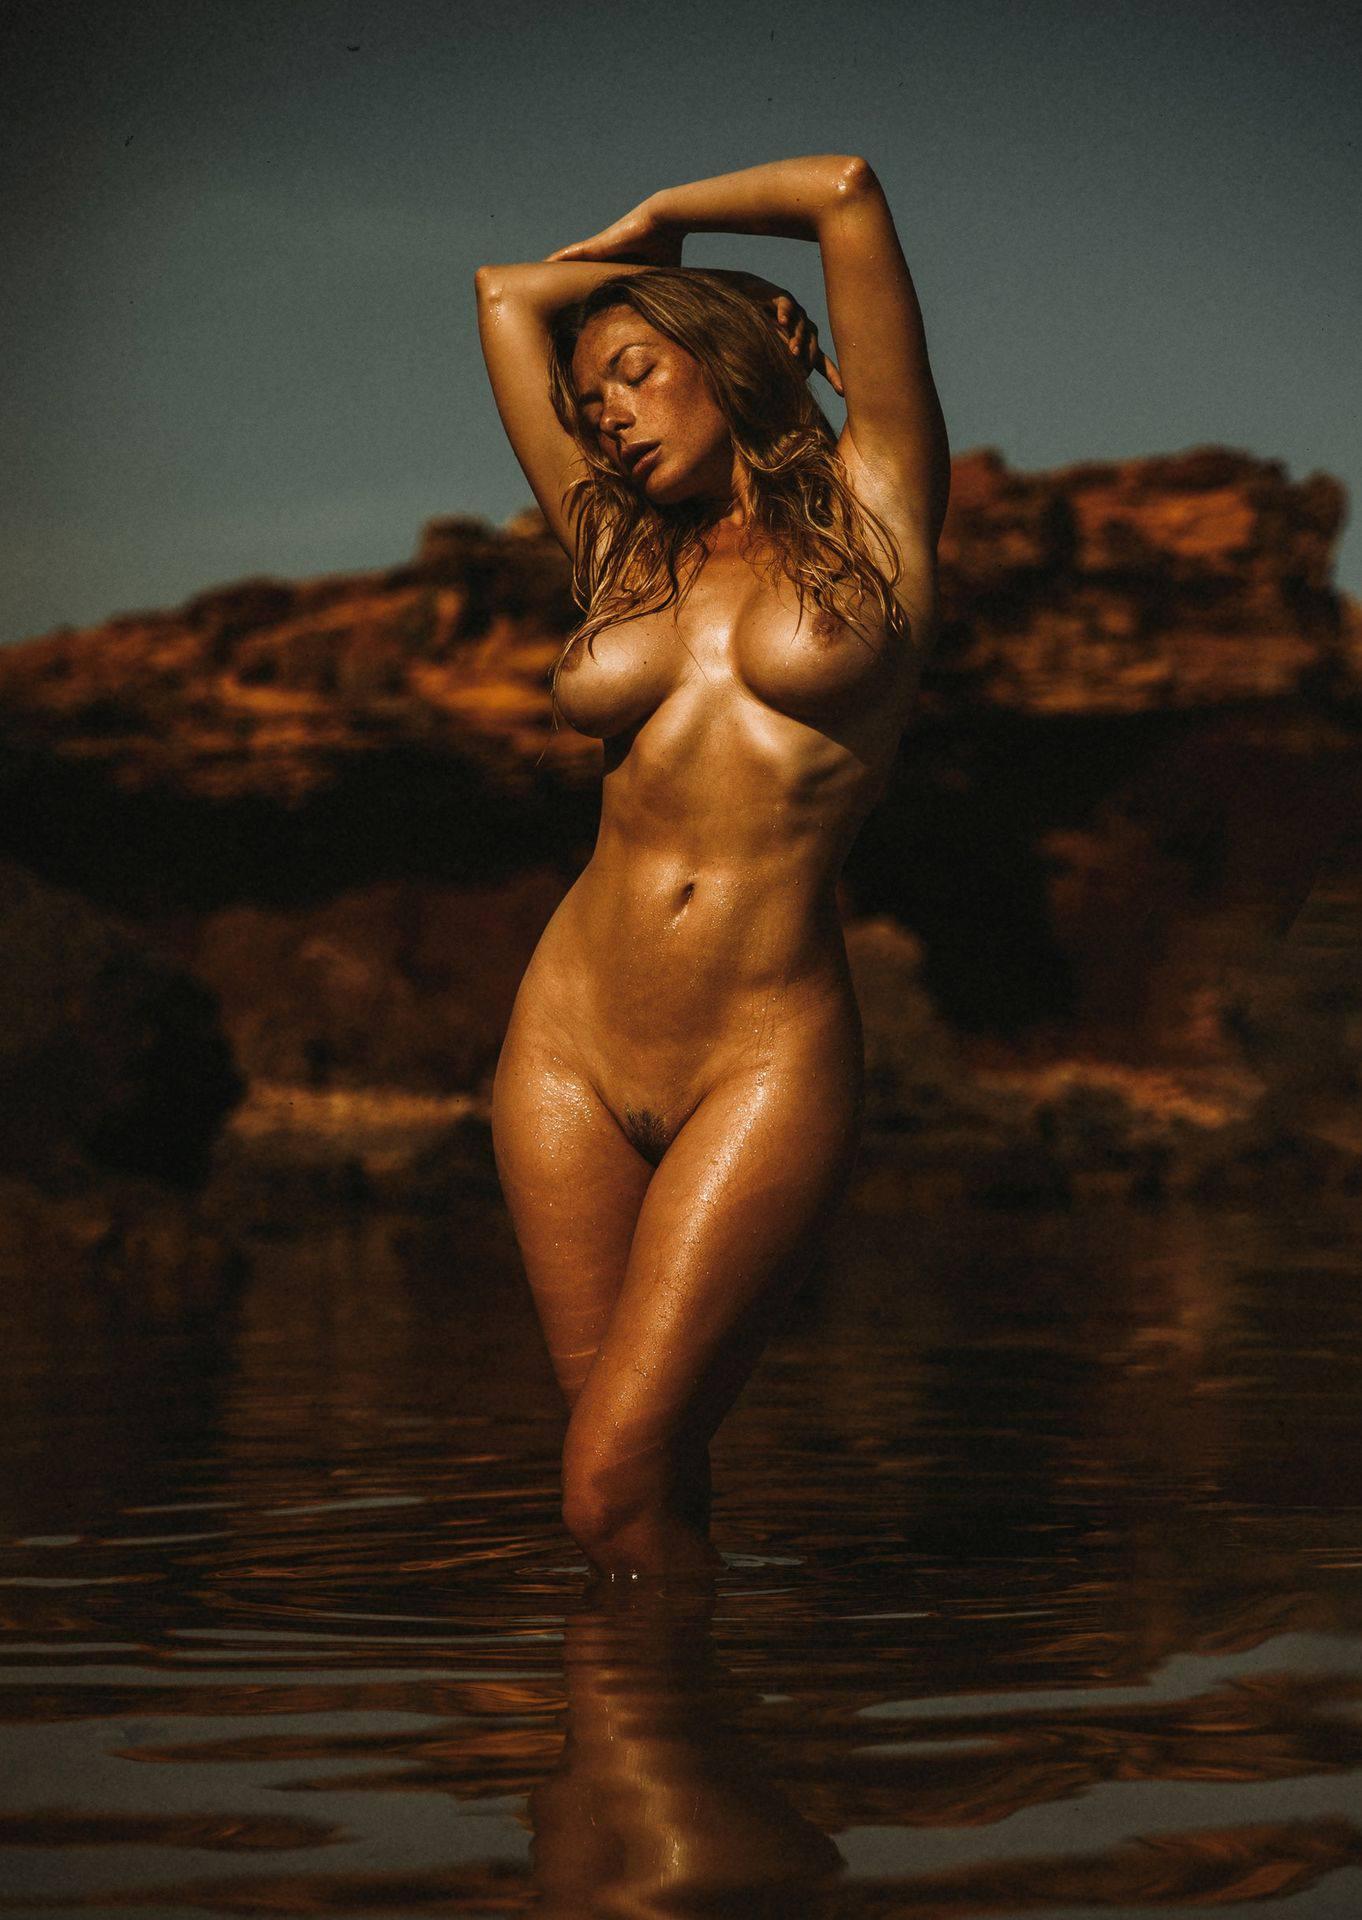 Olga Kobzar – Hot Big Boobs In Sexy Full Frontal Nude Photoshoot By Thomas Agatz (nsfw) 0001